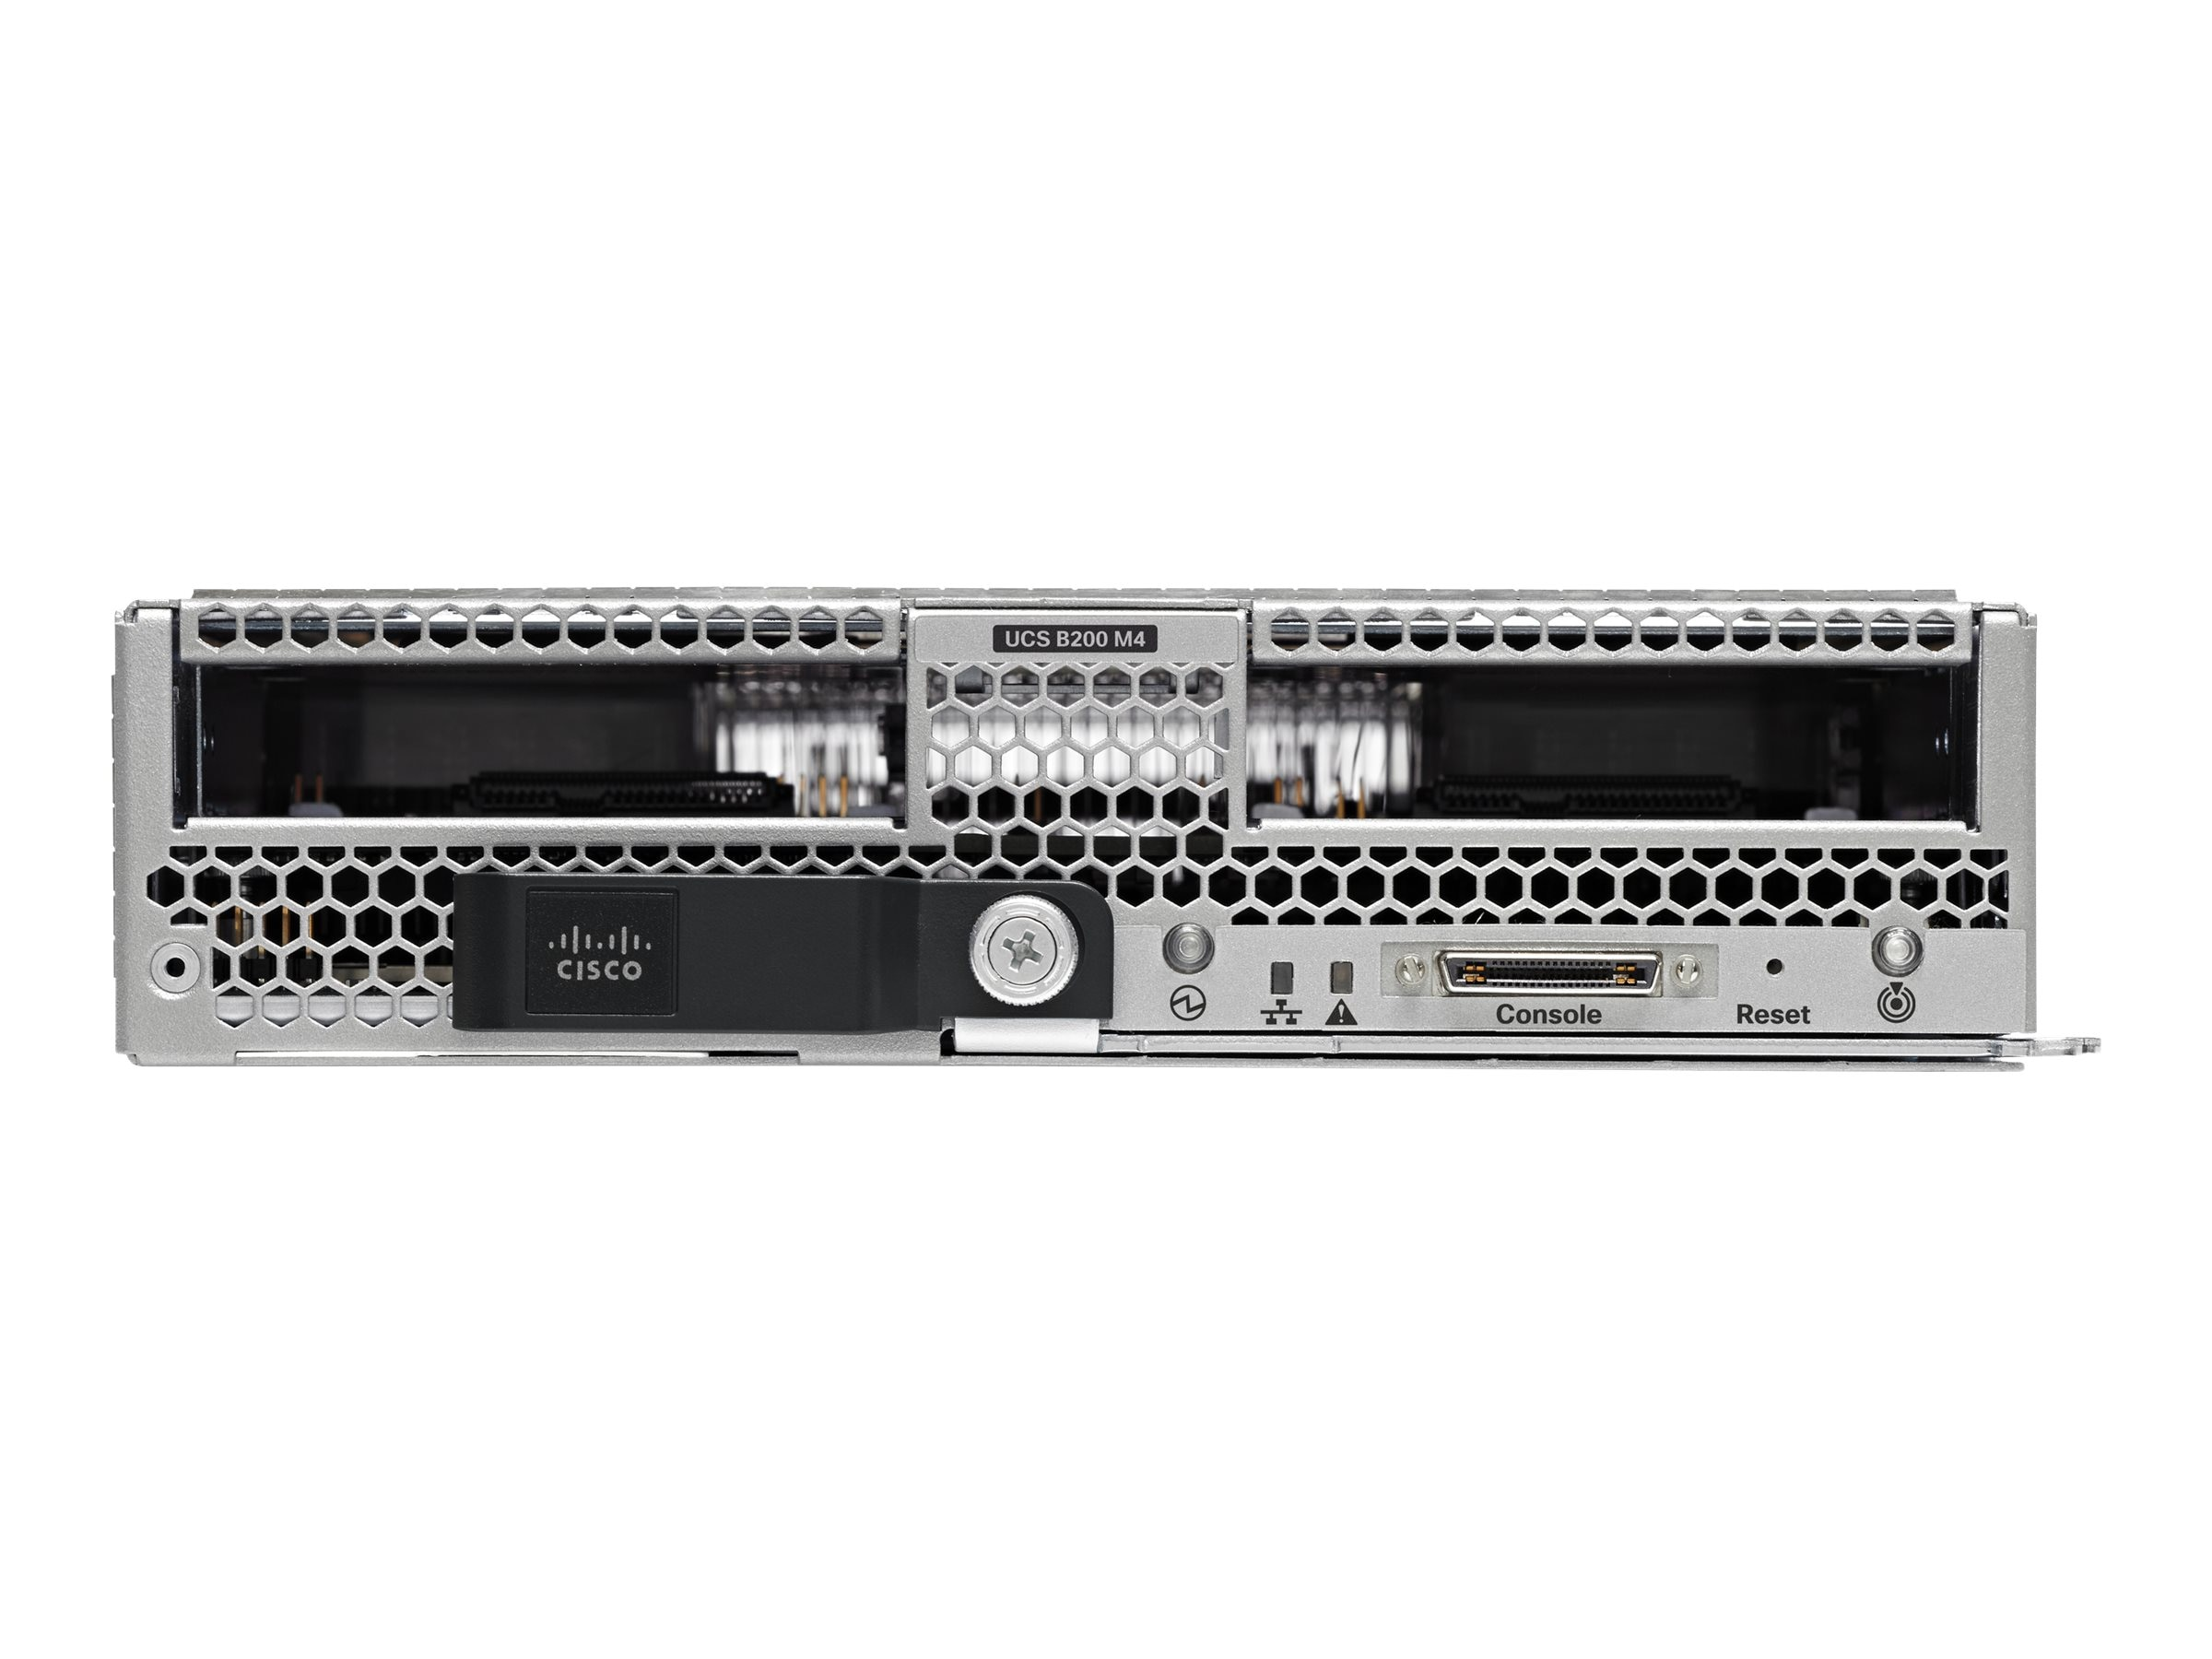 Cisco UCS SmartPlay B200 M4 Intel 2 4GHz Xeon Xeon